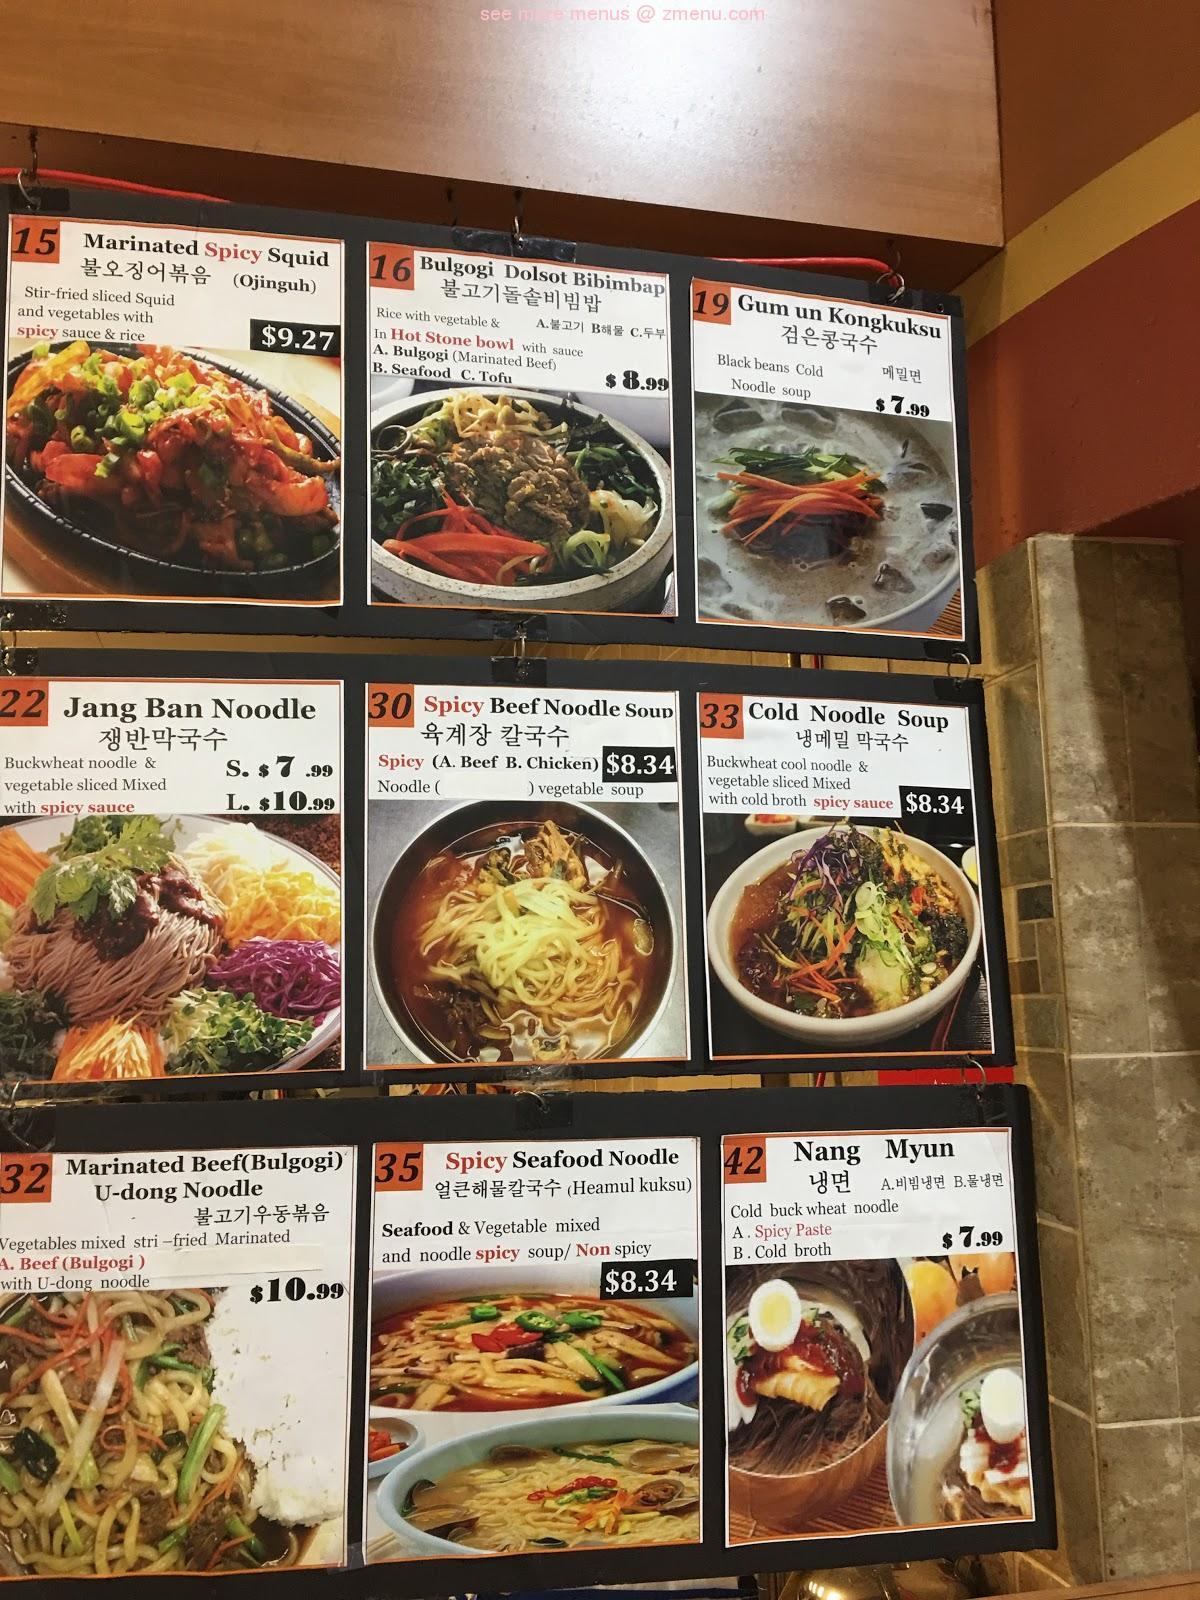 Online Menu Of Miga Restaurant Johns Creek Georgia 30097 Zmenu